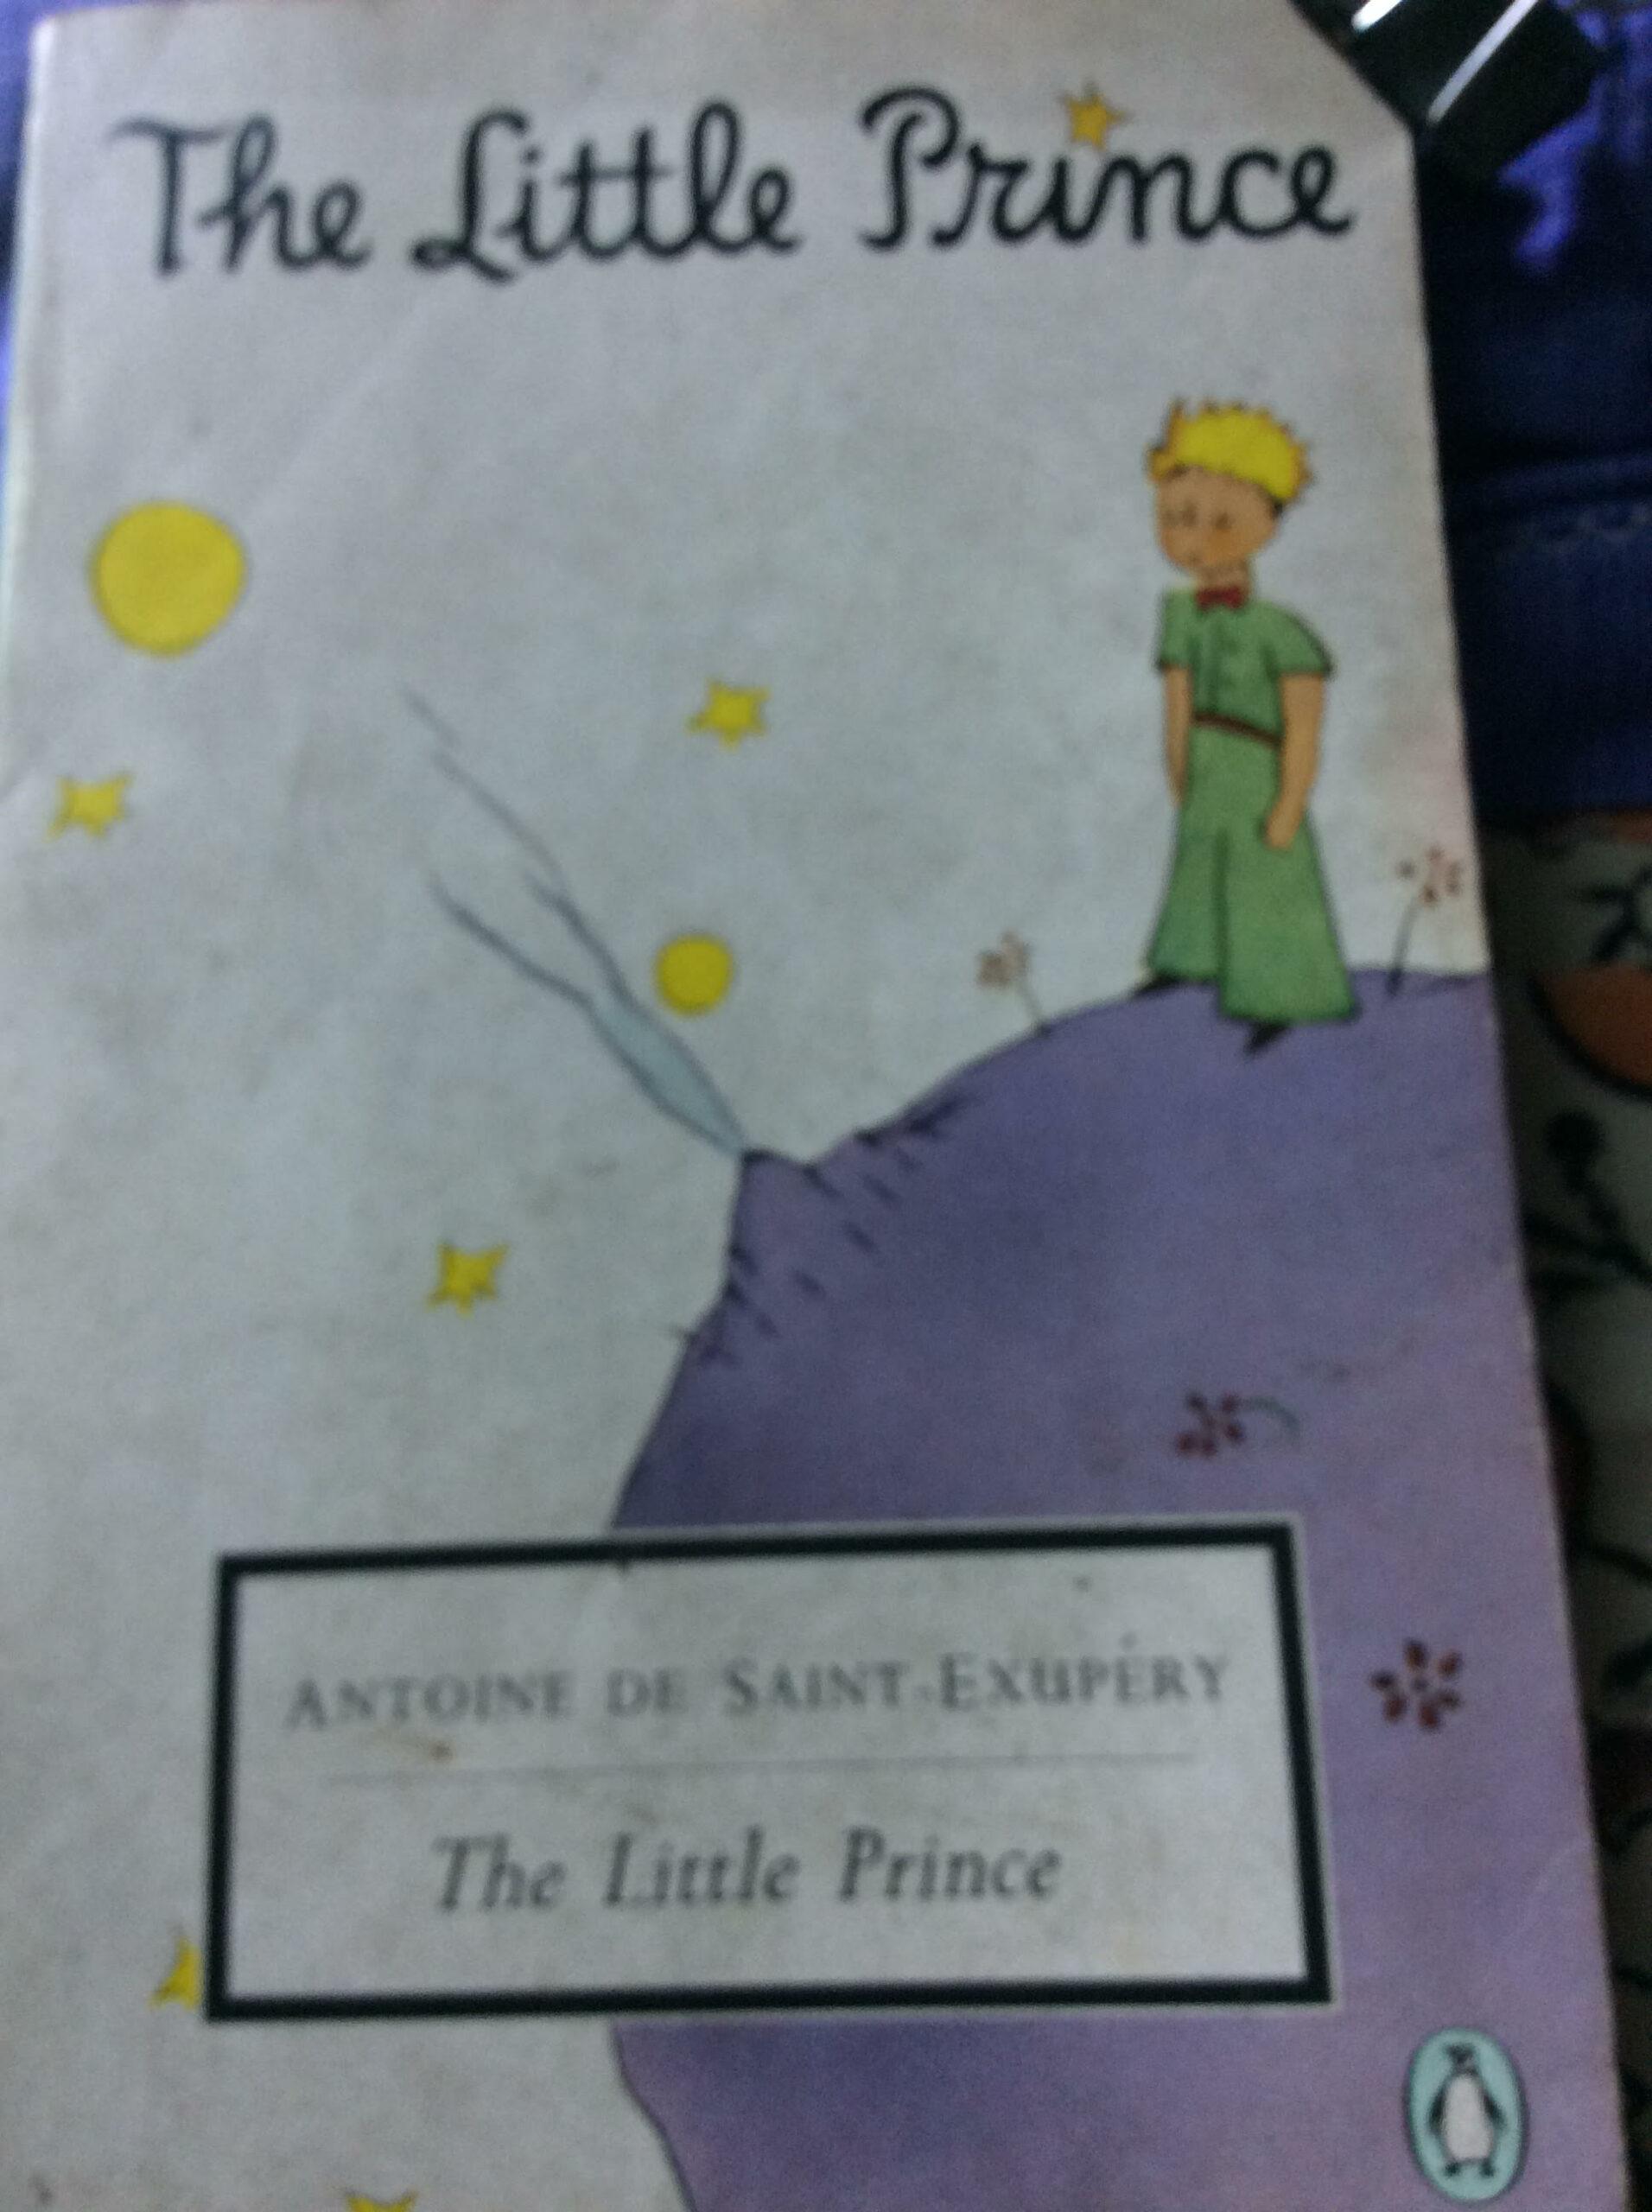 Transcend Media Service The Little Prince And Antoine De Saint Exupery